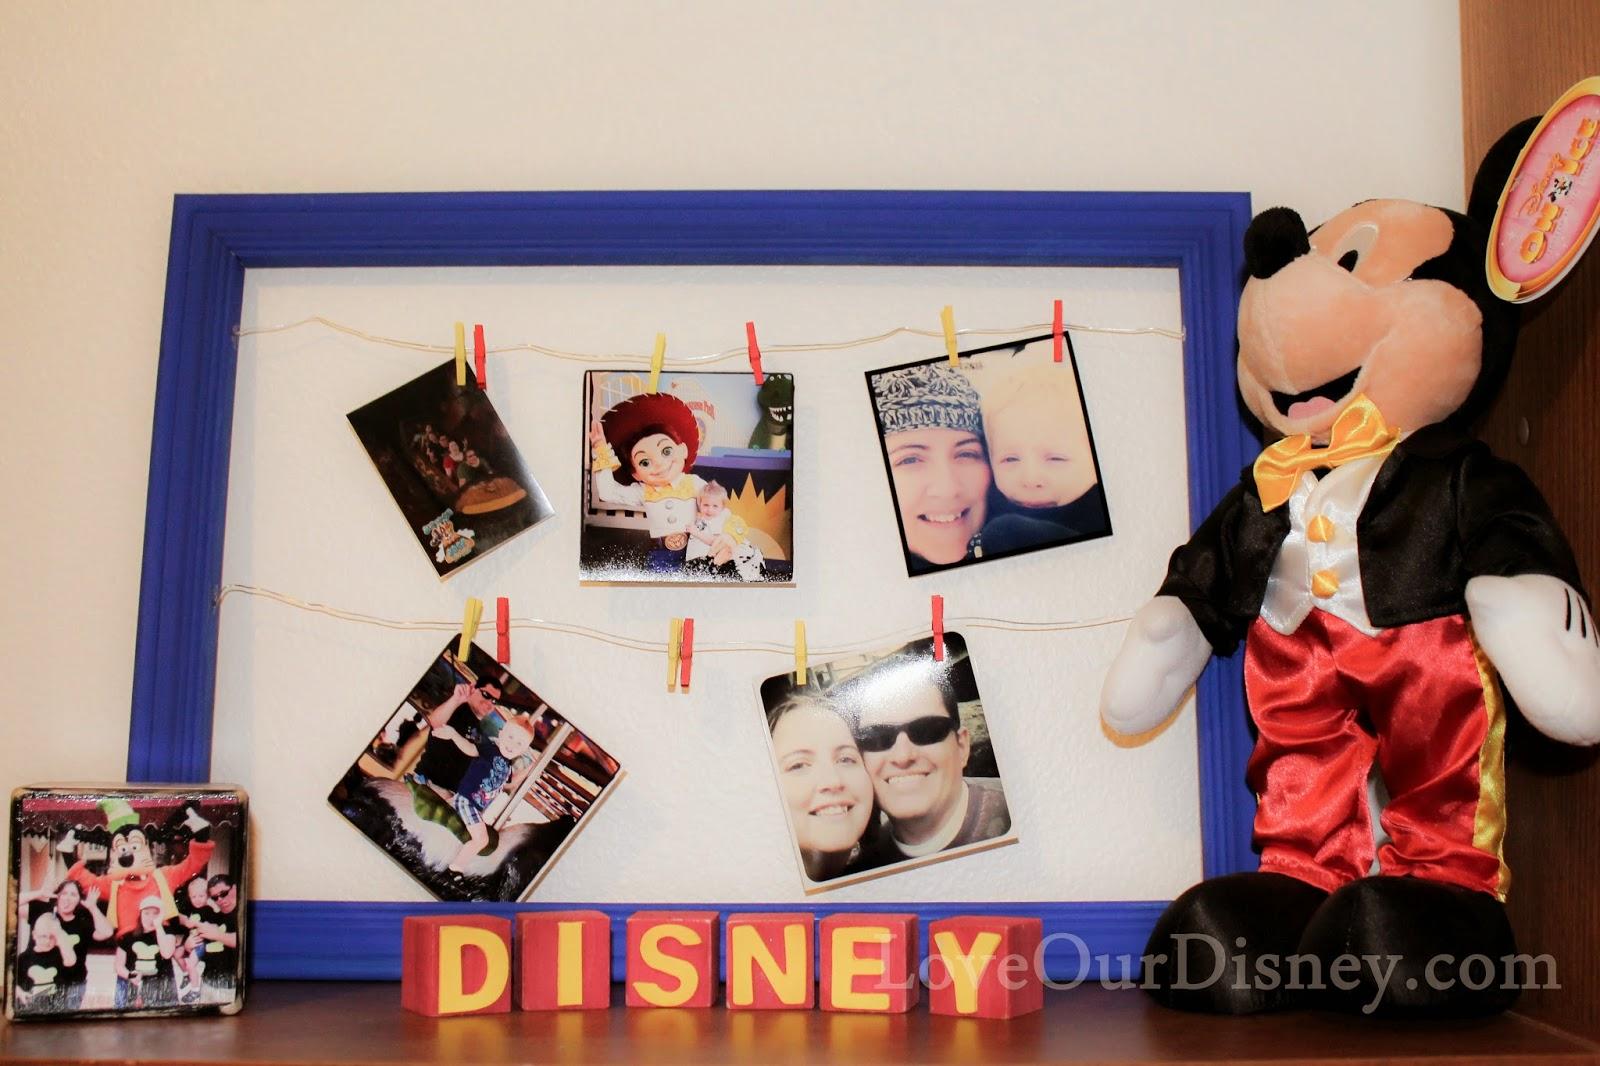 DIY Clothes Line Photo Display from LoveOurDisney.com